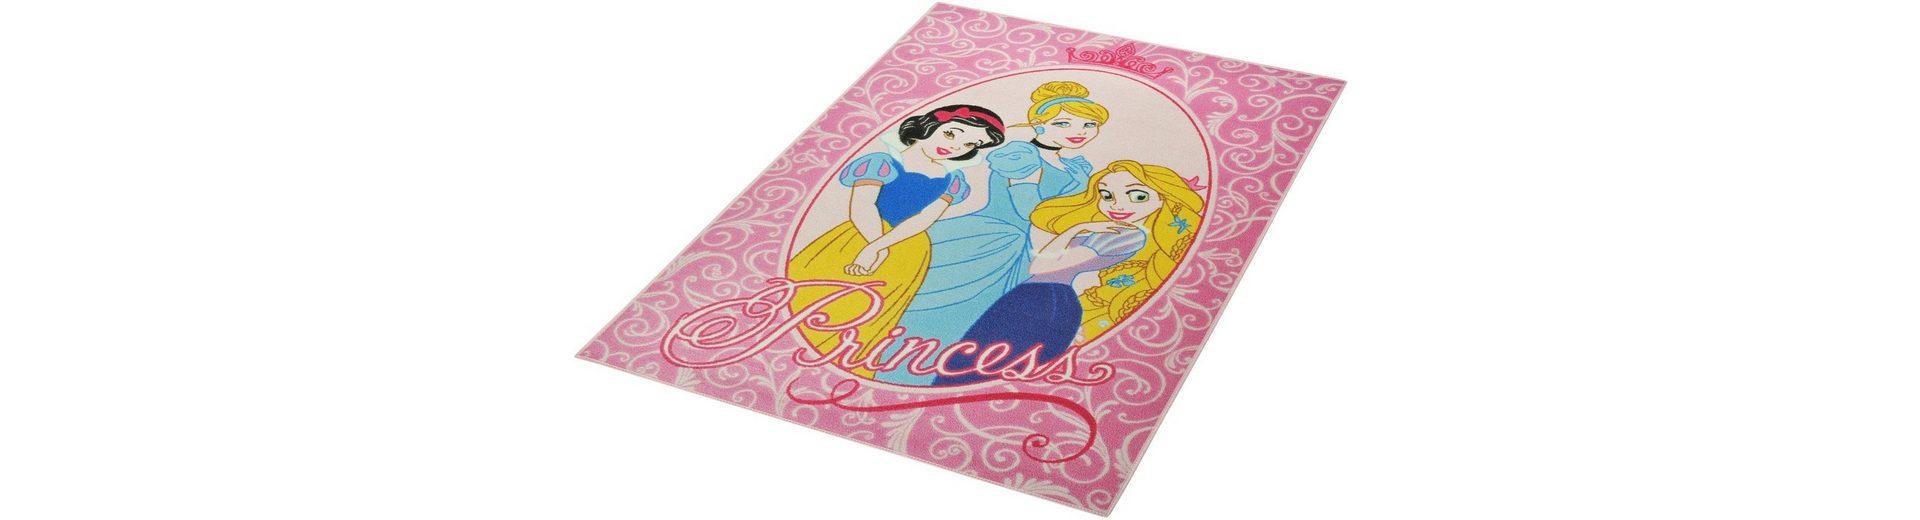 Kinder-Teppich, Disney Lizenz Teppich »Princess«, getuftet